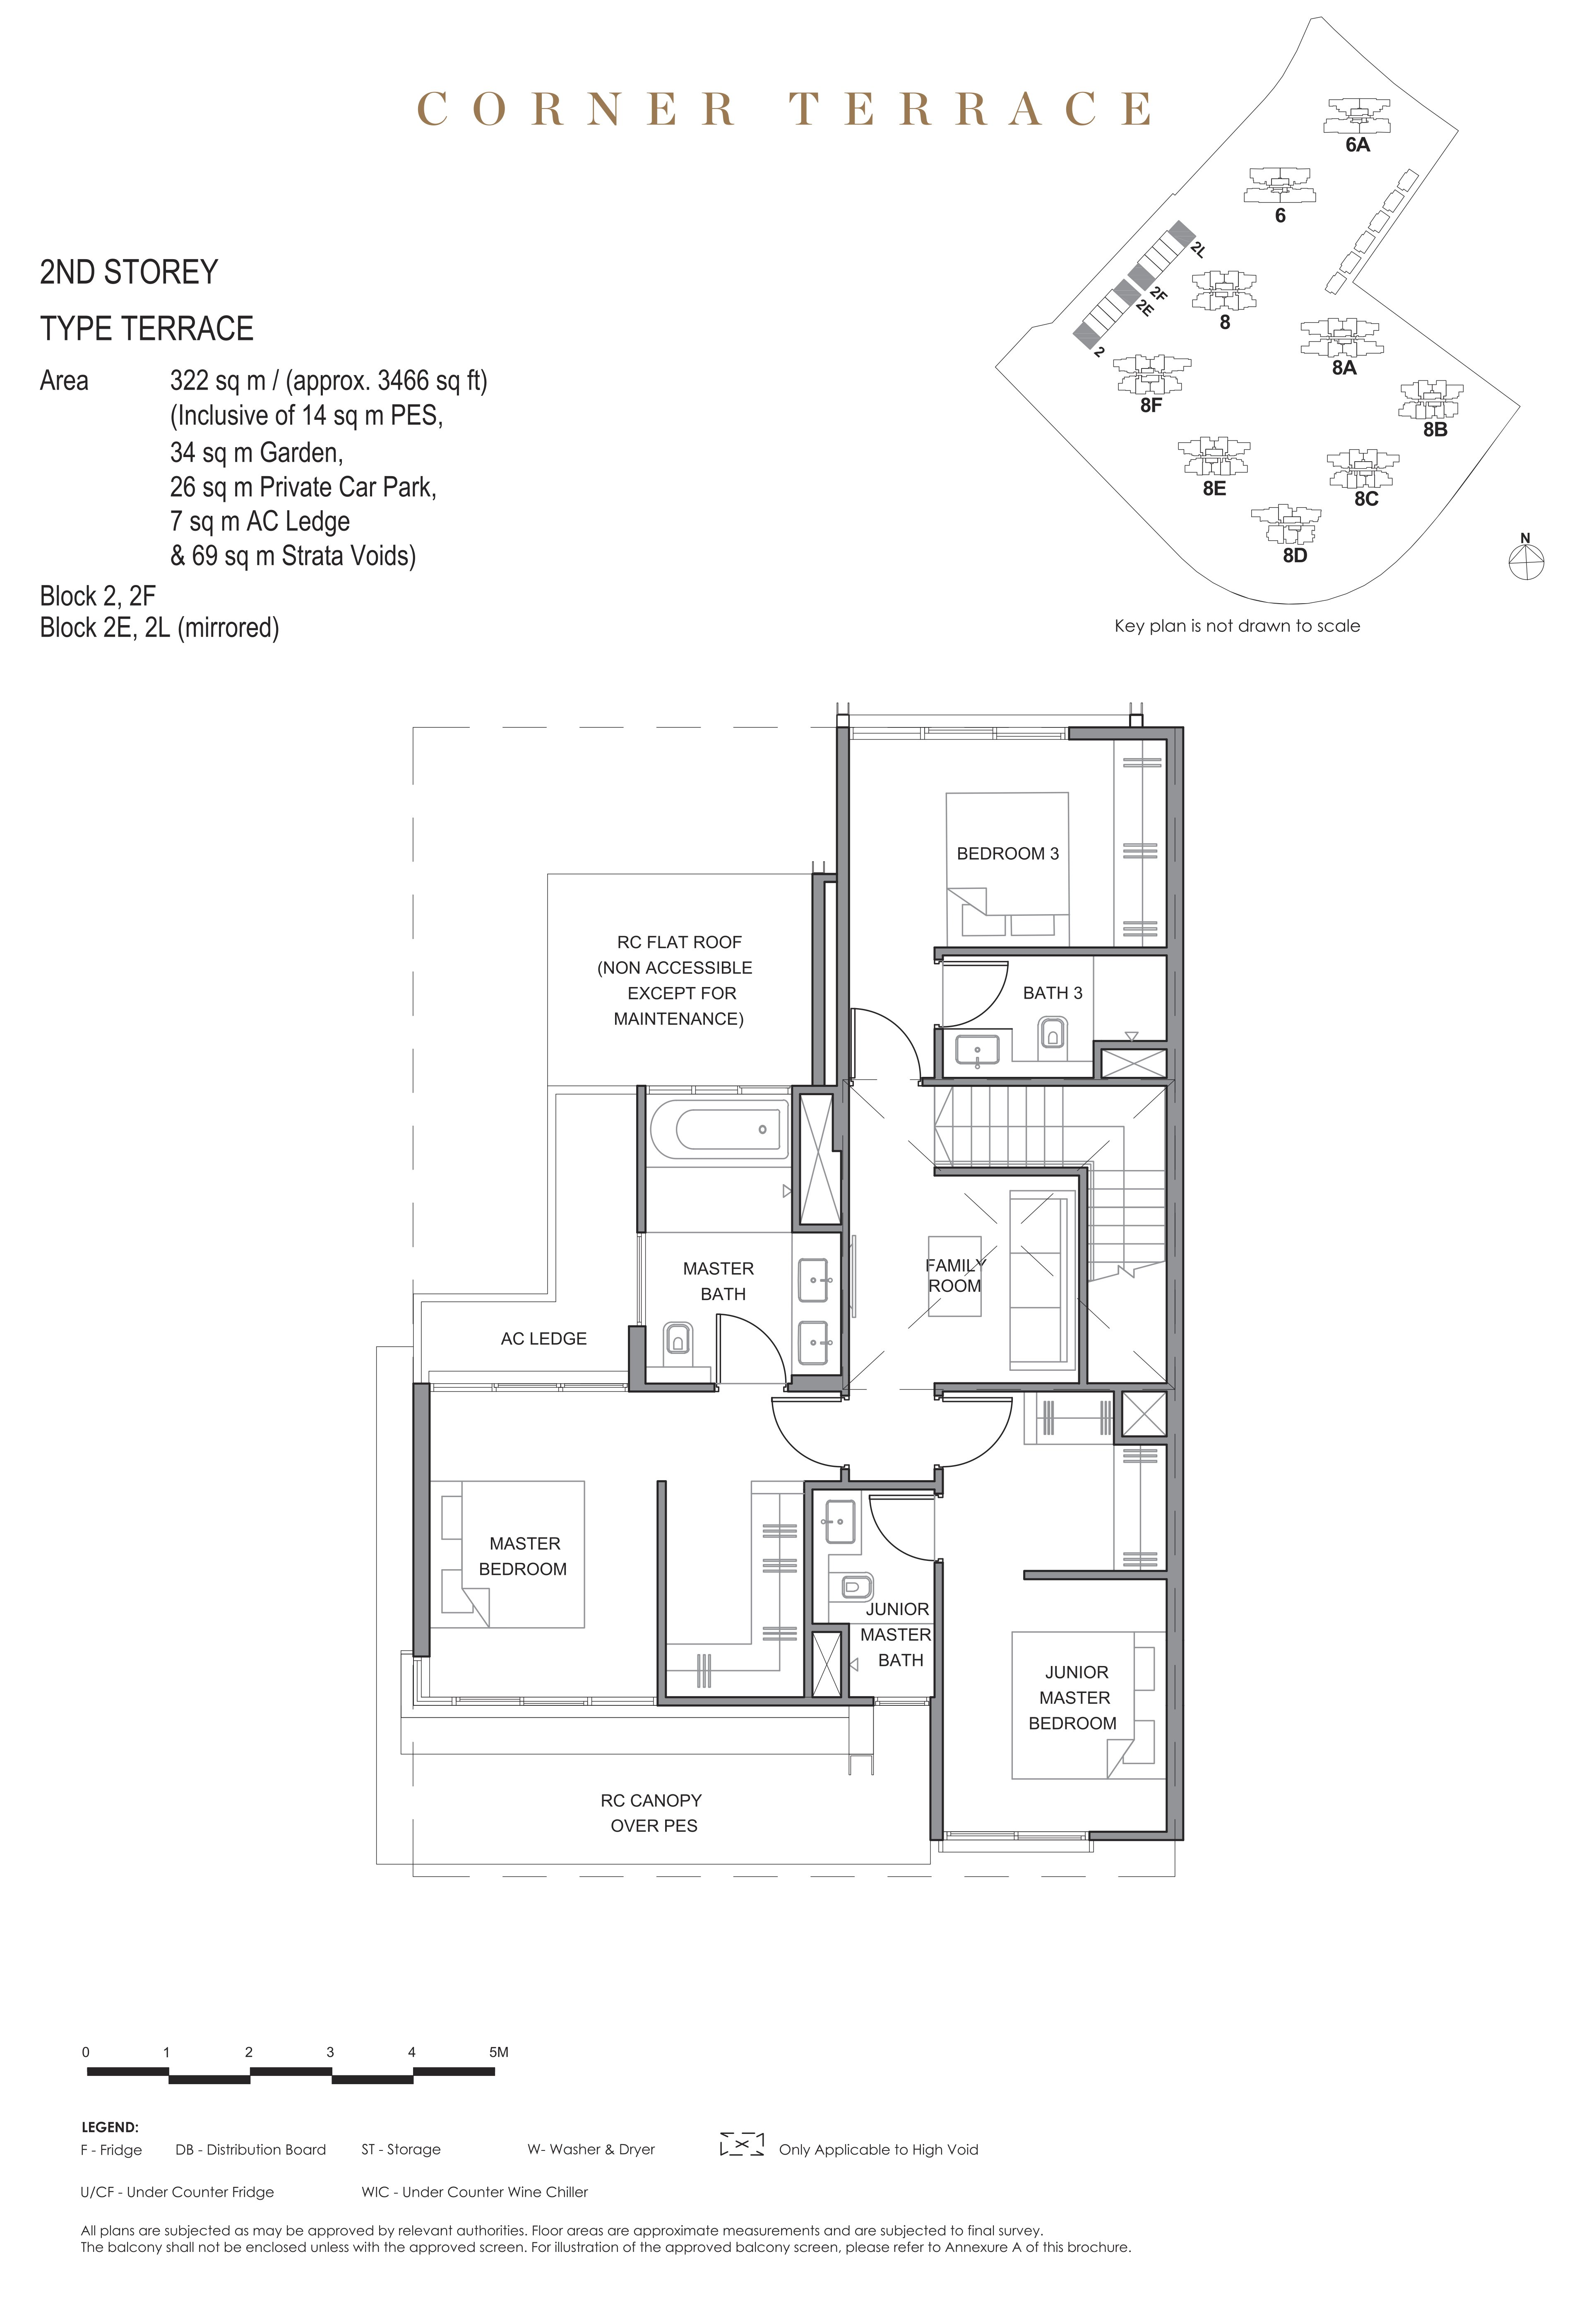 Parc Clematis 锦泰门第 masterpiece corner terrace 2nd storey